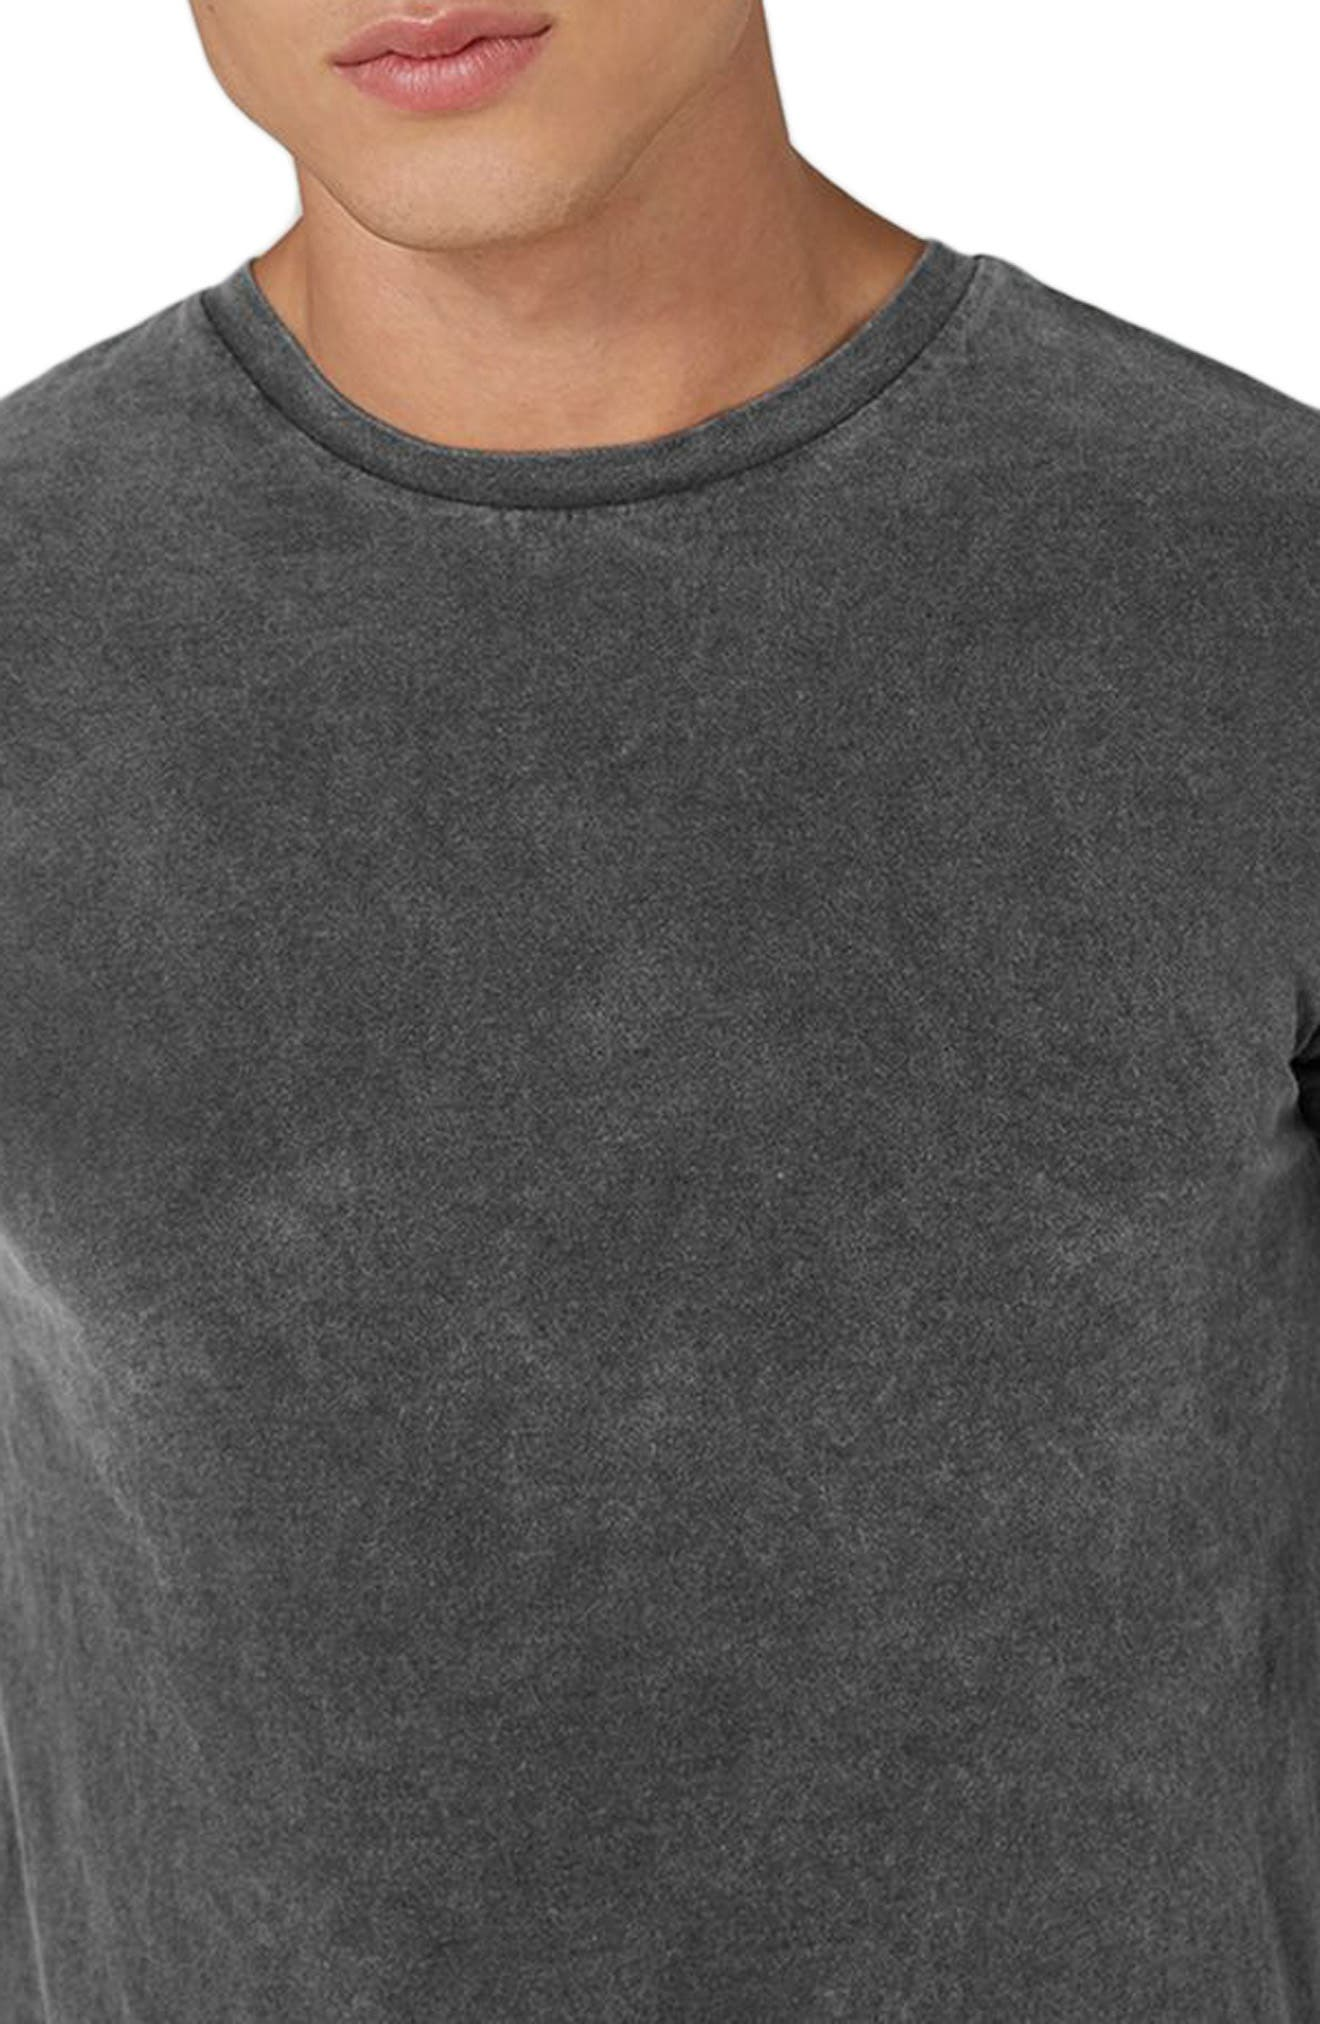 Alternate Image 3  - Topman Acid Wash Classic Fit T-Shirt